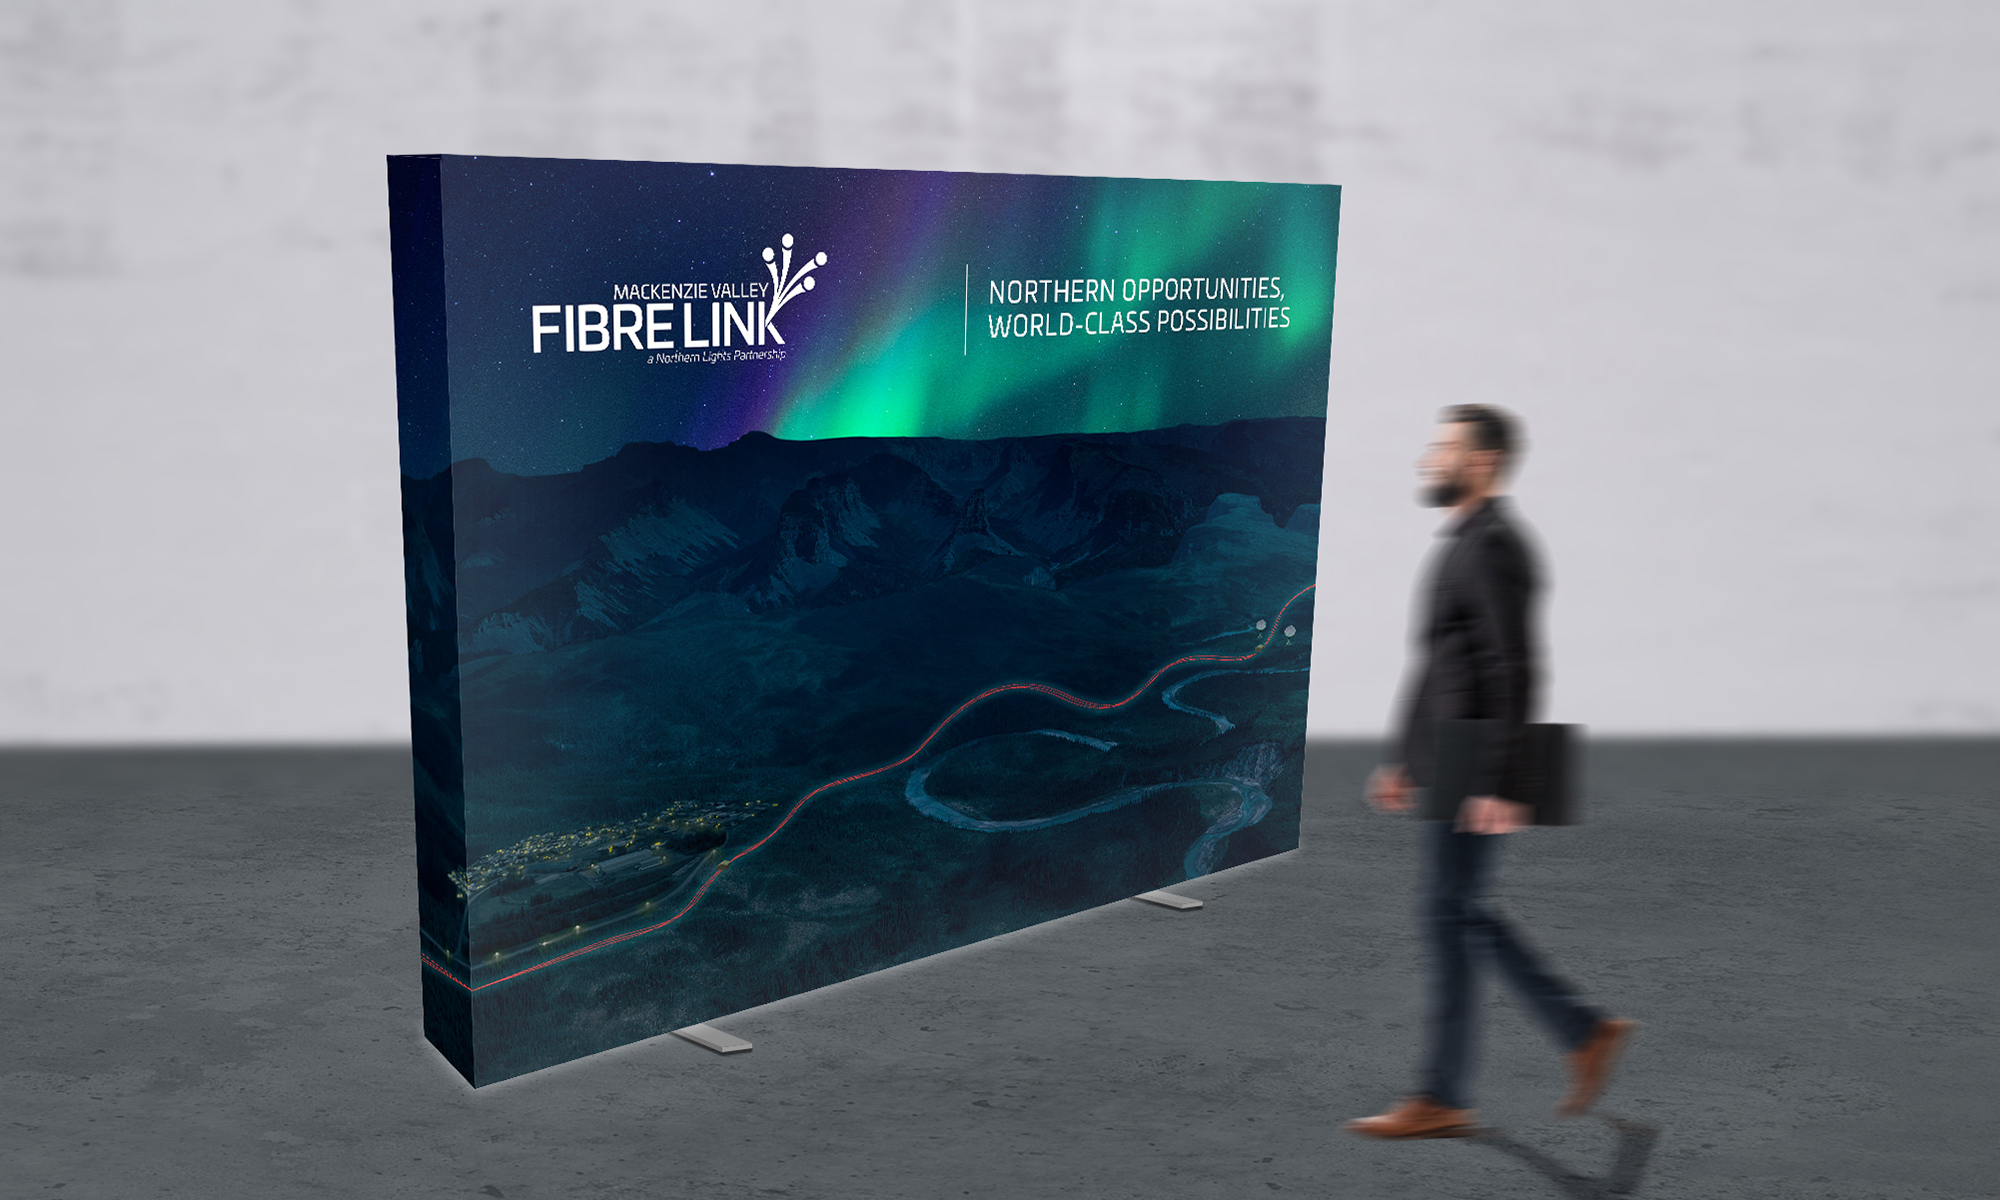 Print design sample of backlit trade show booth for Mackenzie Valley Fibrelink.